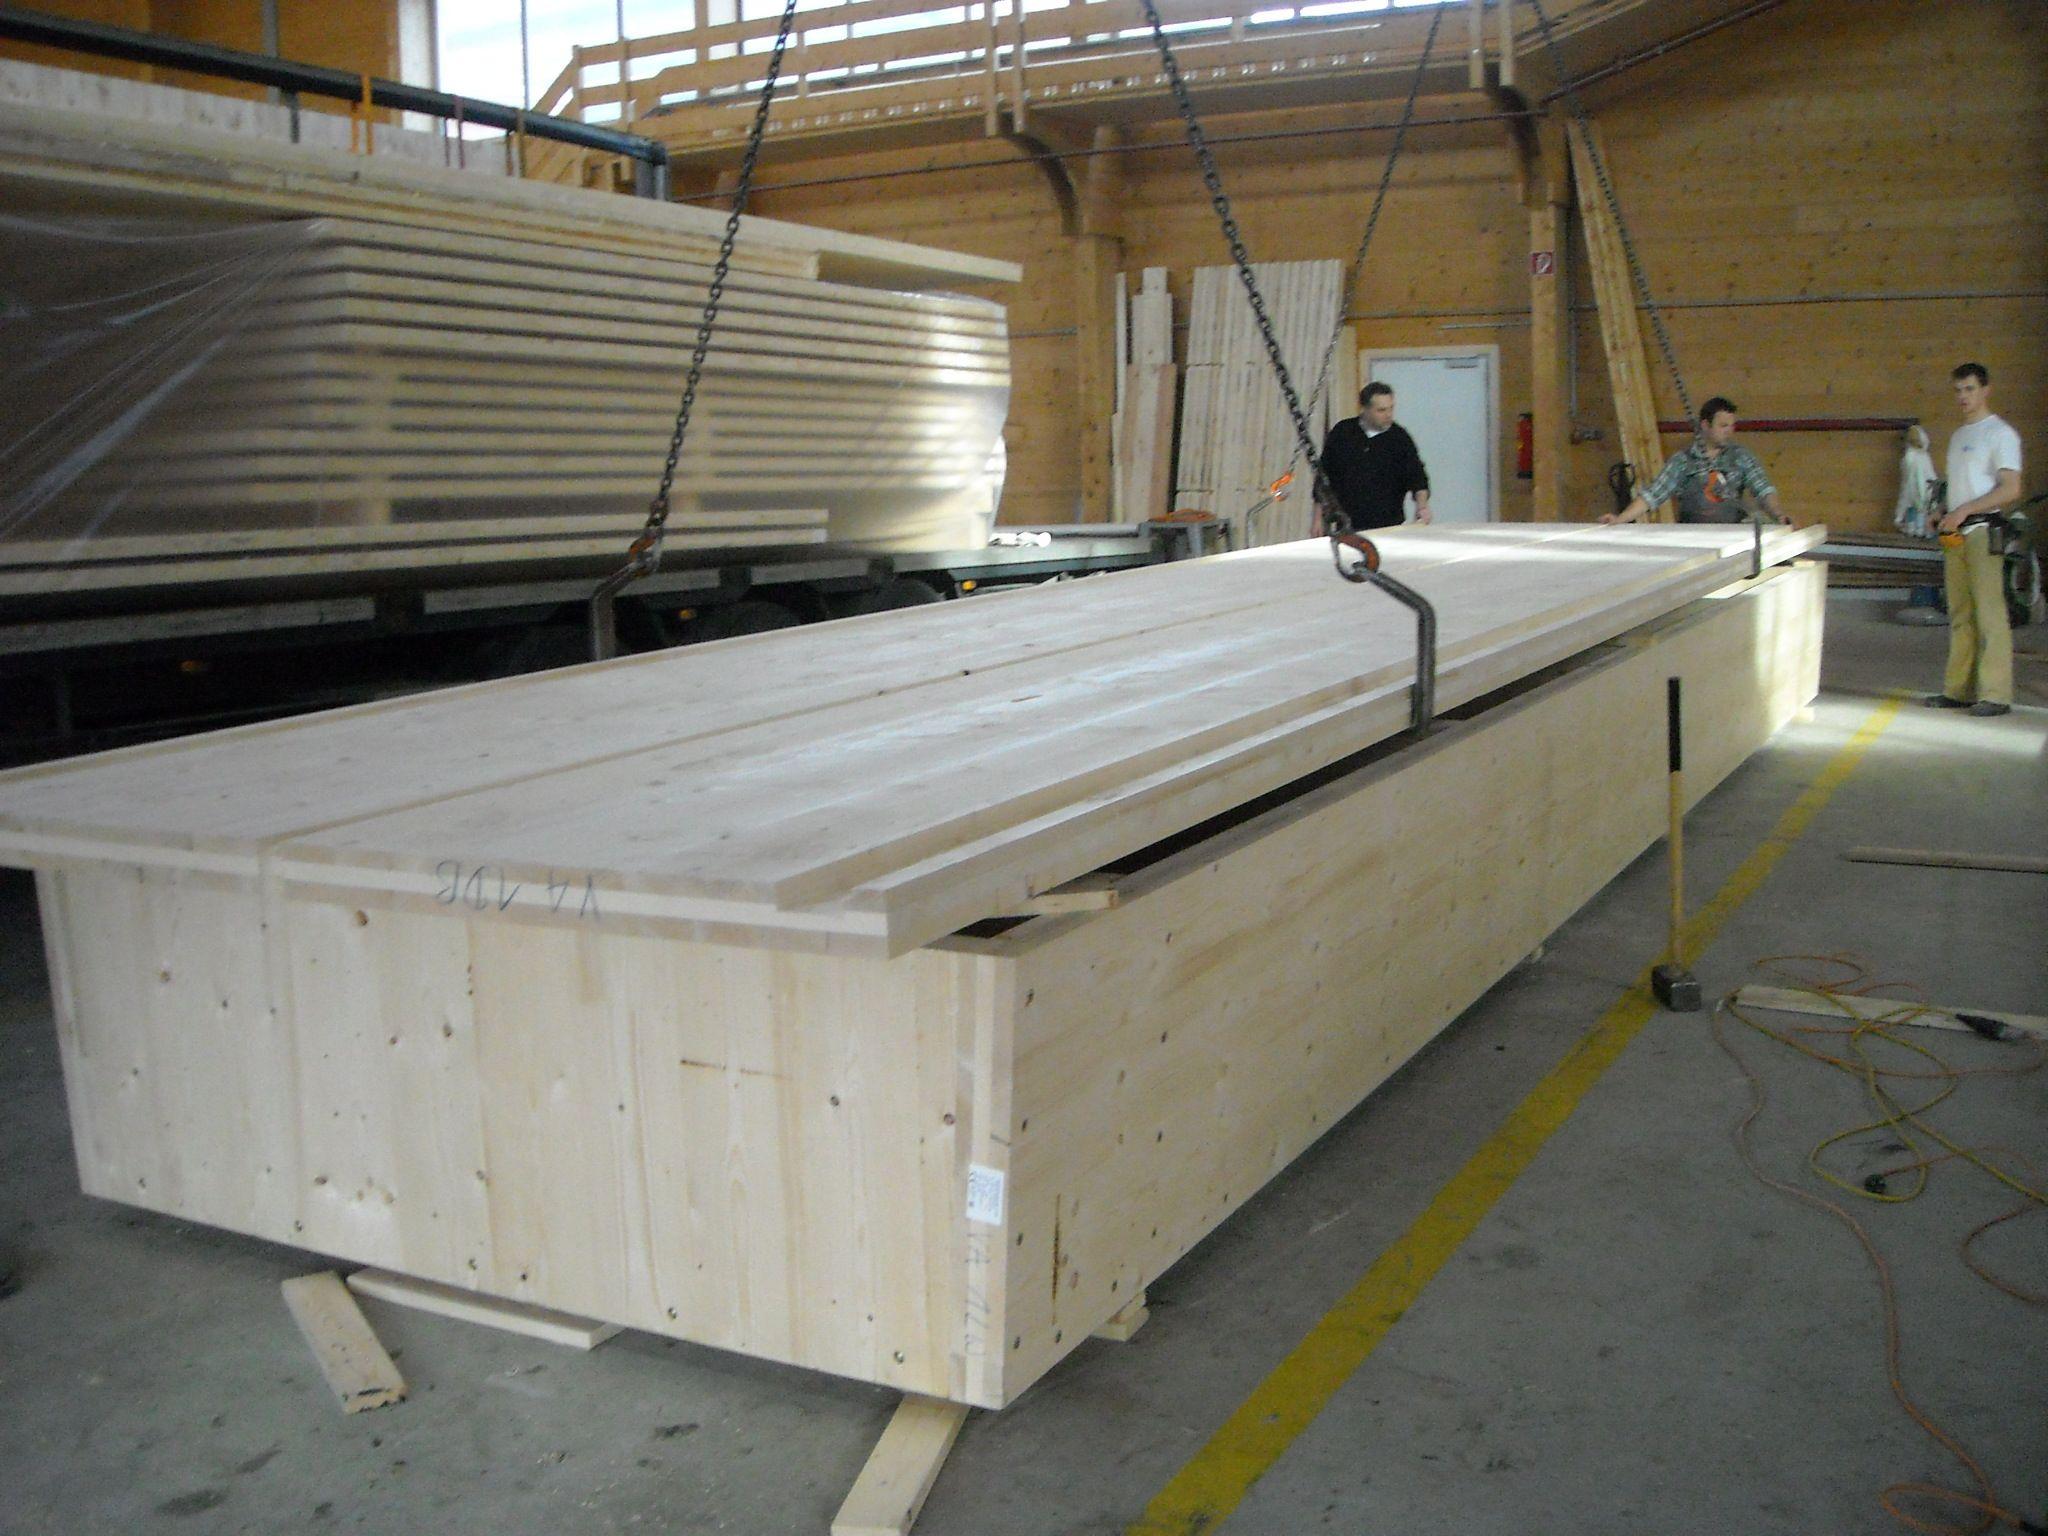 inovatives pontonsystem aus holz paolo timber ponton system architecture. Black Bedroom Furniture Sets. Home Design Ideas